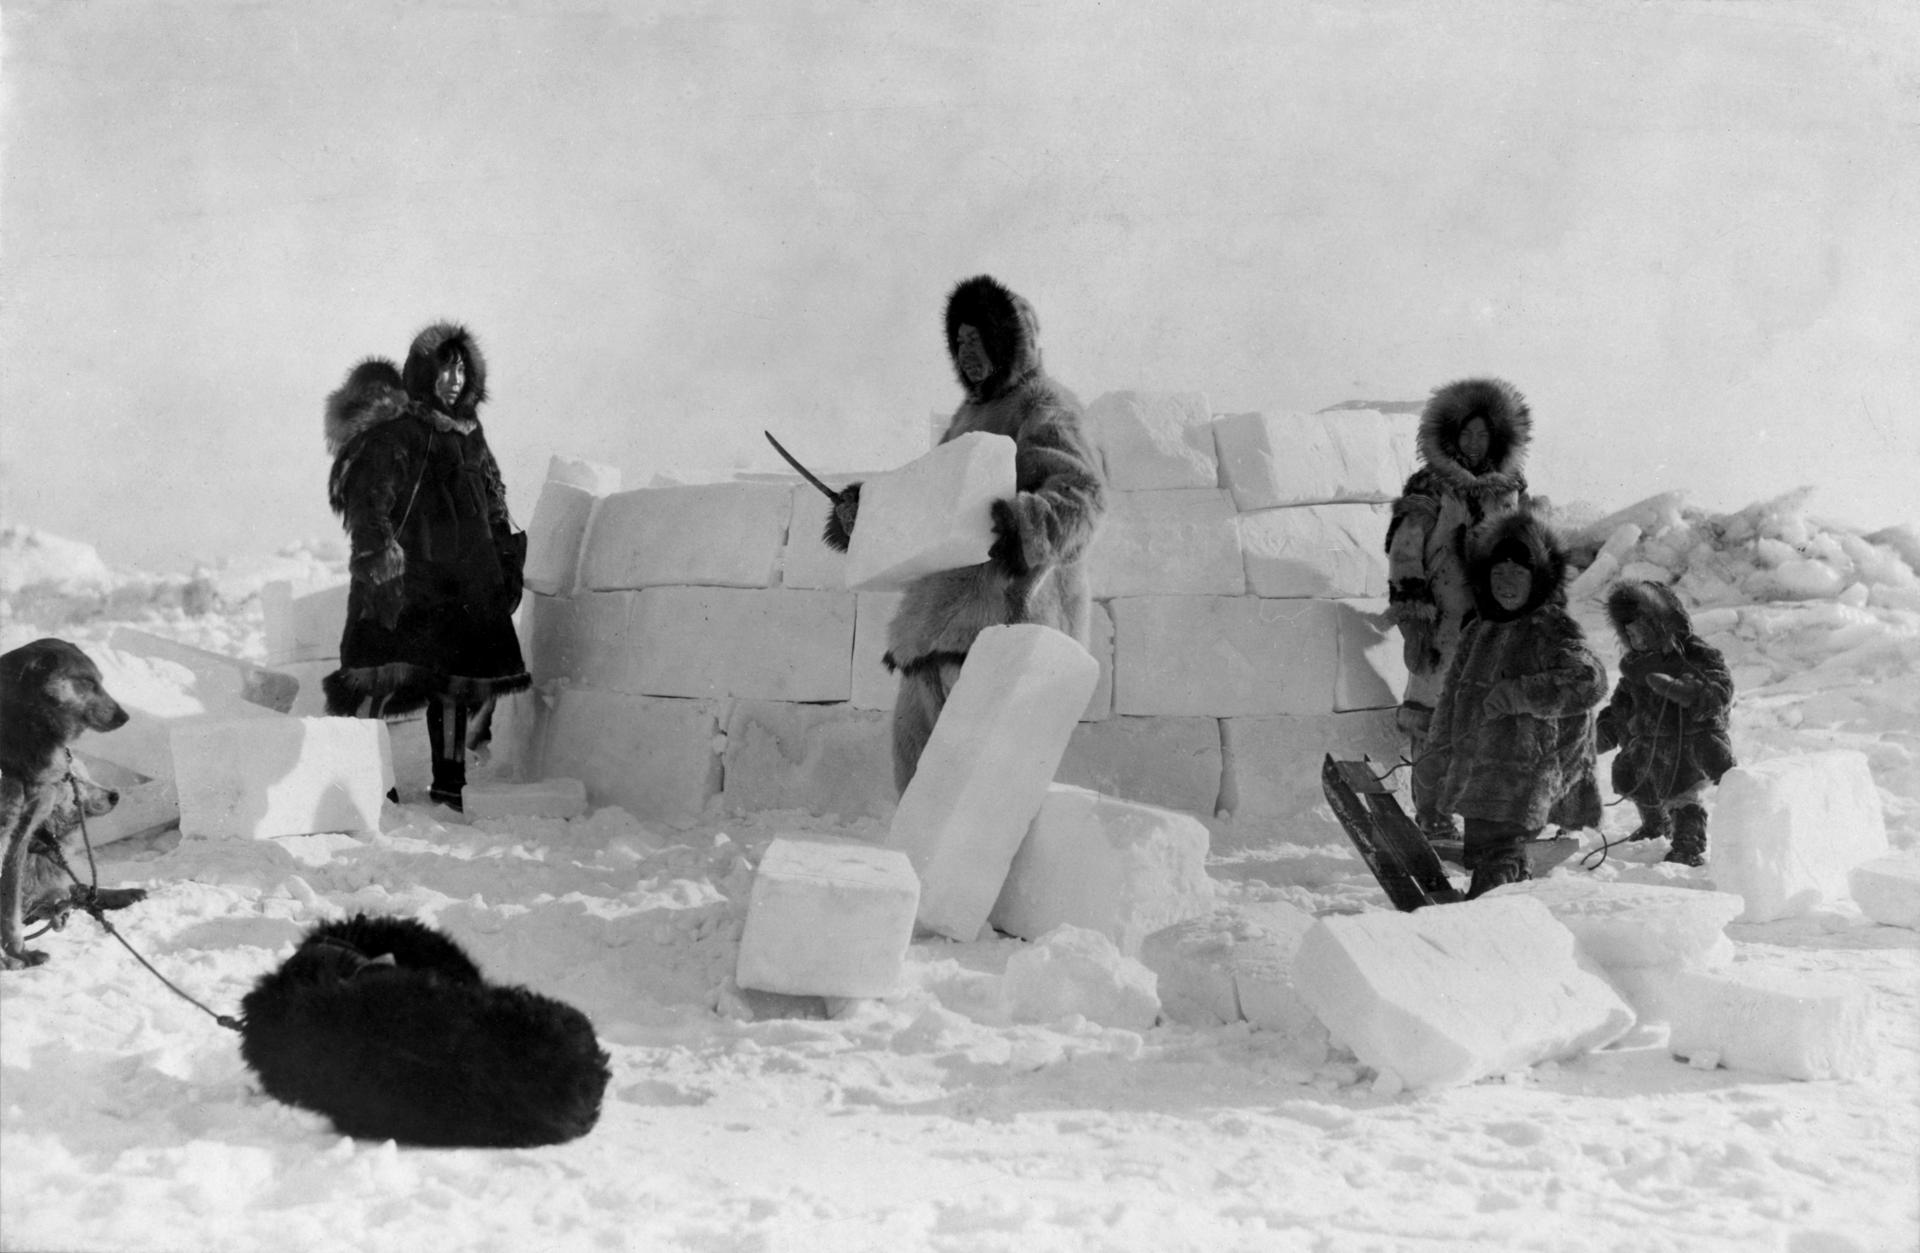 Inuit-Igloo_P-1.png